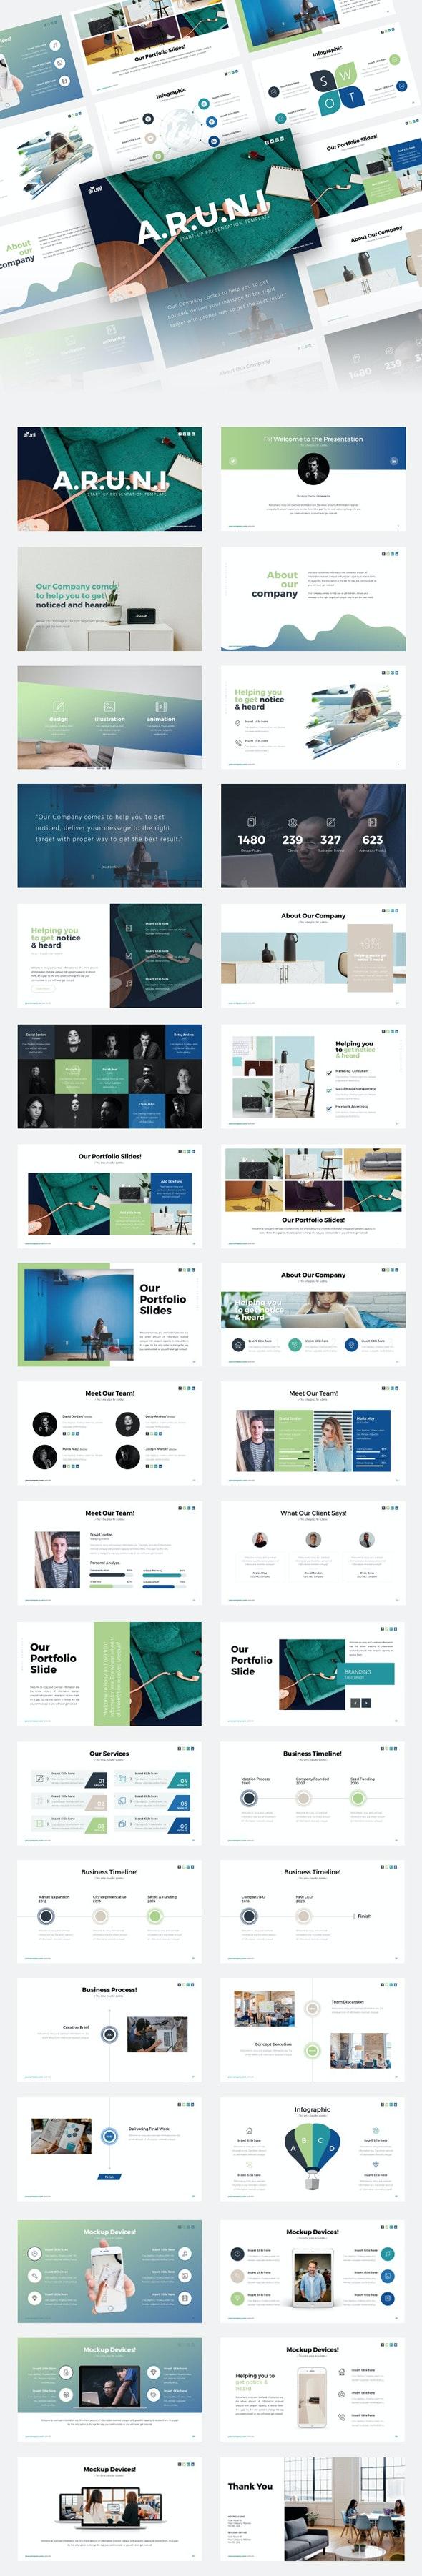 Aruni Start-up Business Presentation Template - Creative PowerPoint Templates